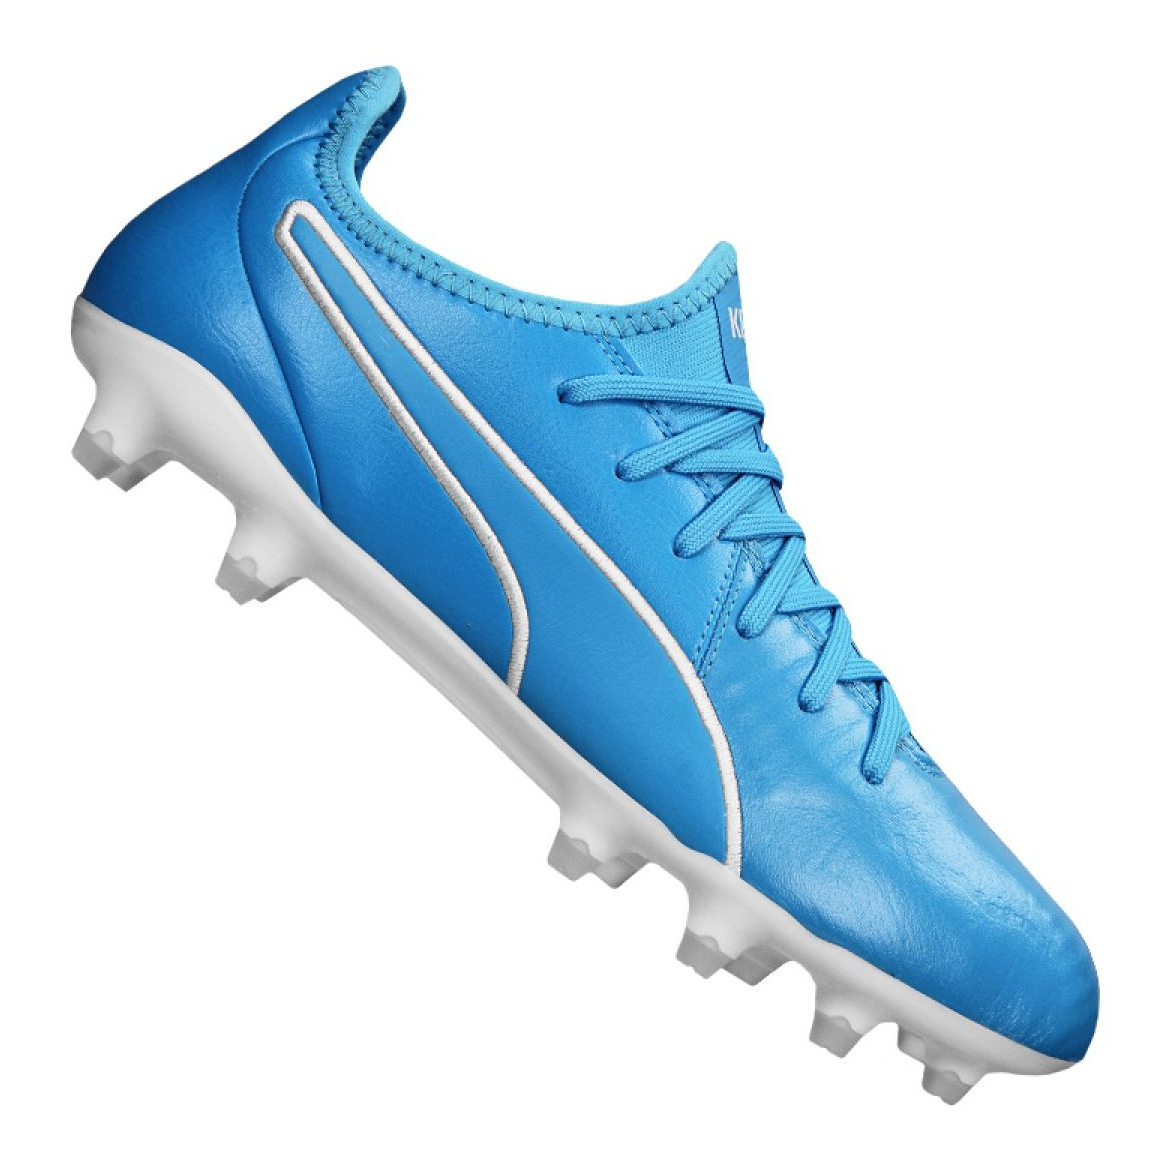 ferita Osservare Fratellanza  Puma King Pro Fg M 105608-04 football boots blue blue - ButyModne.pl